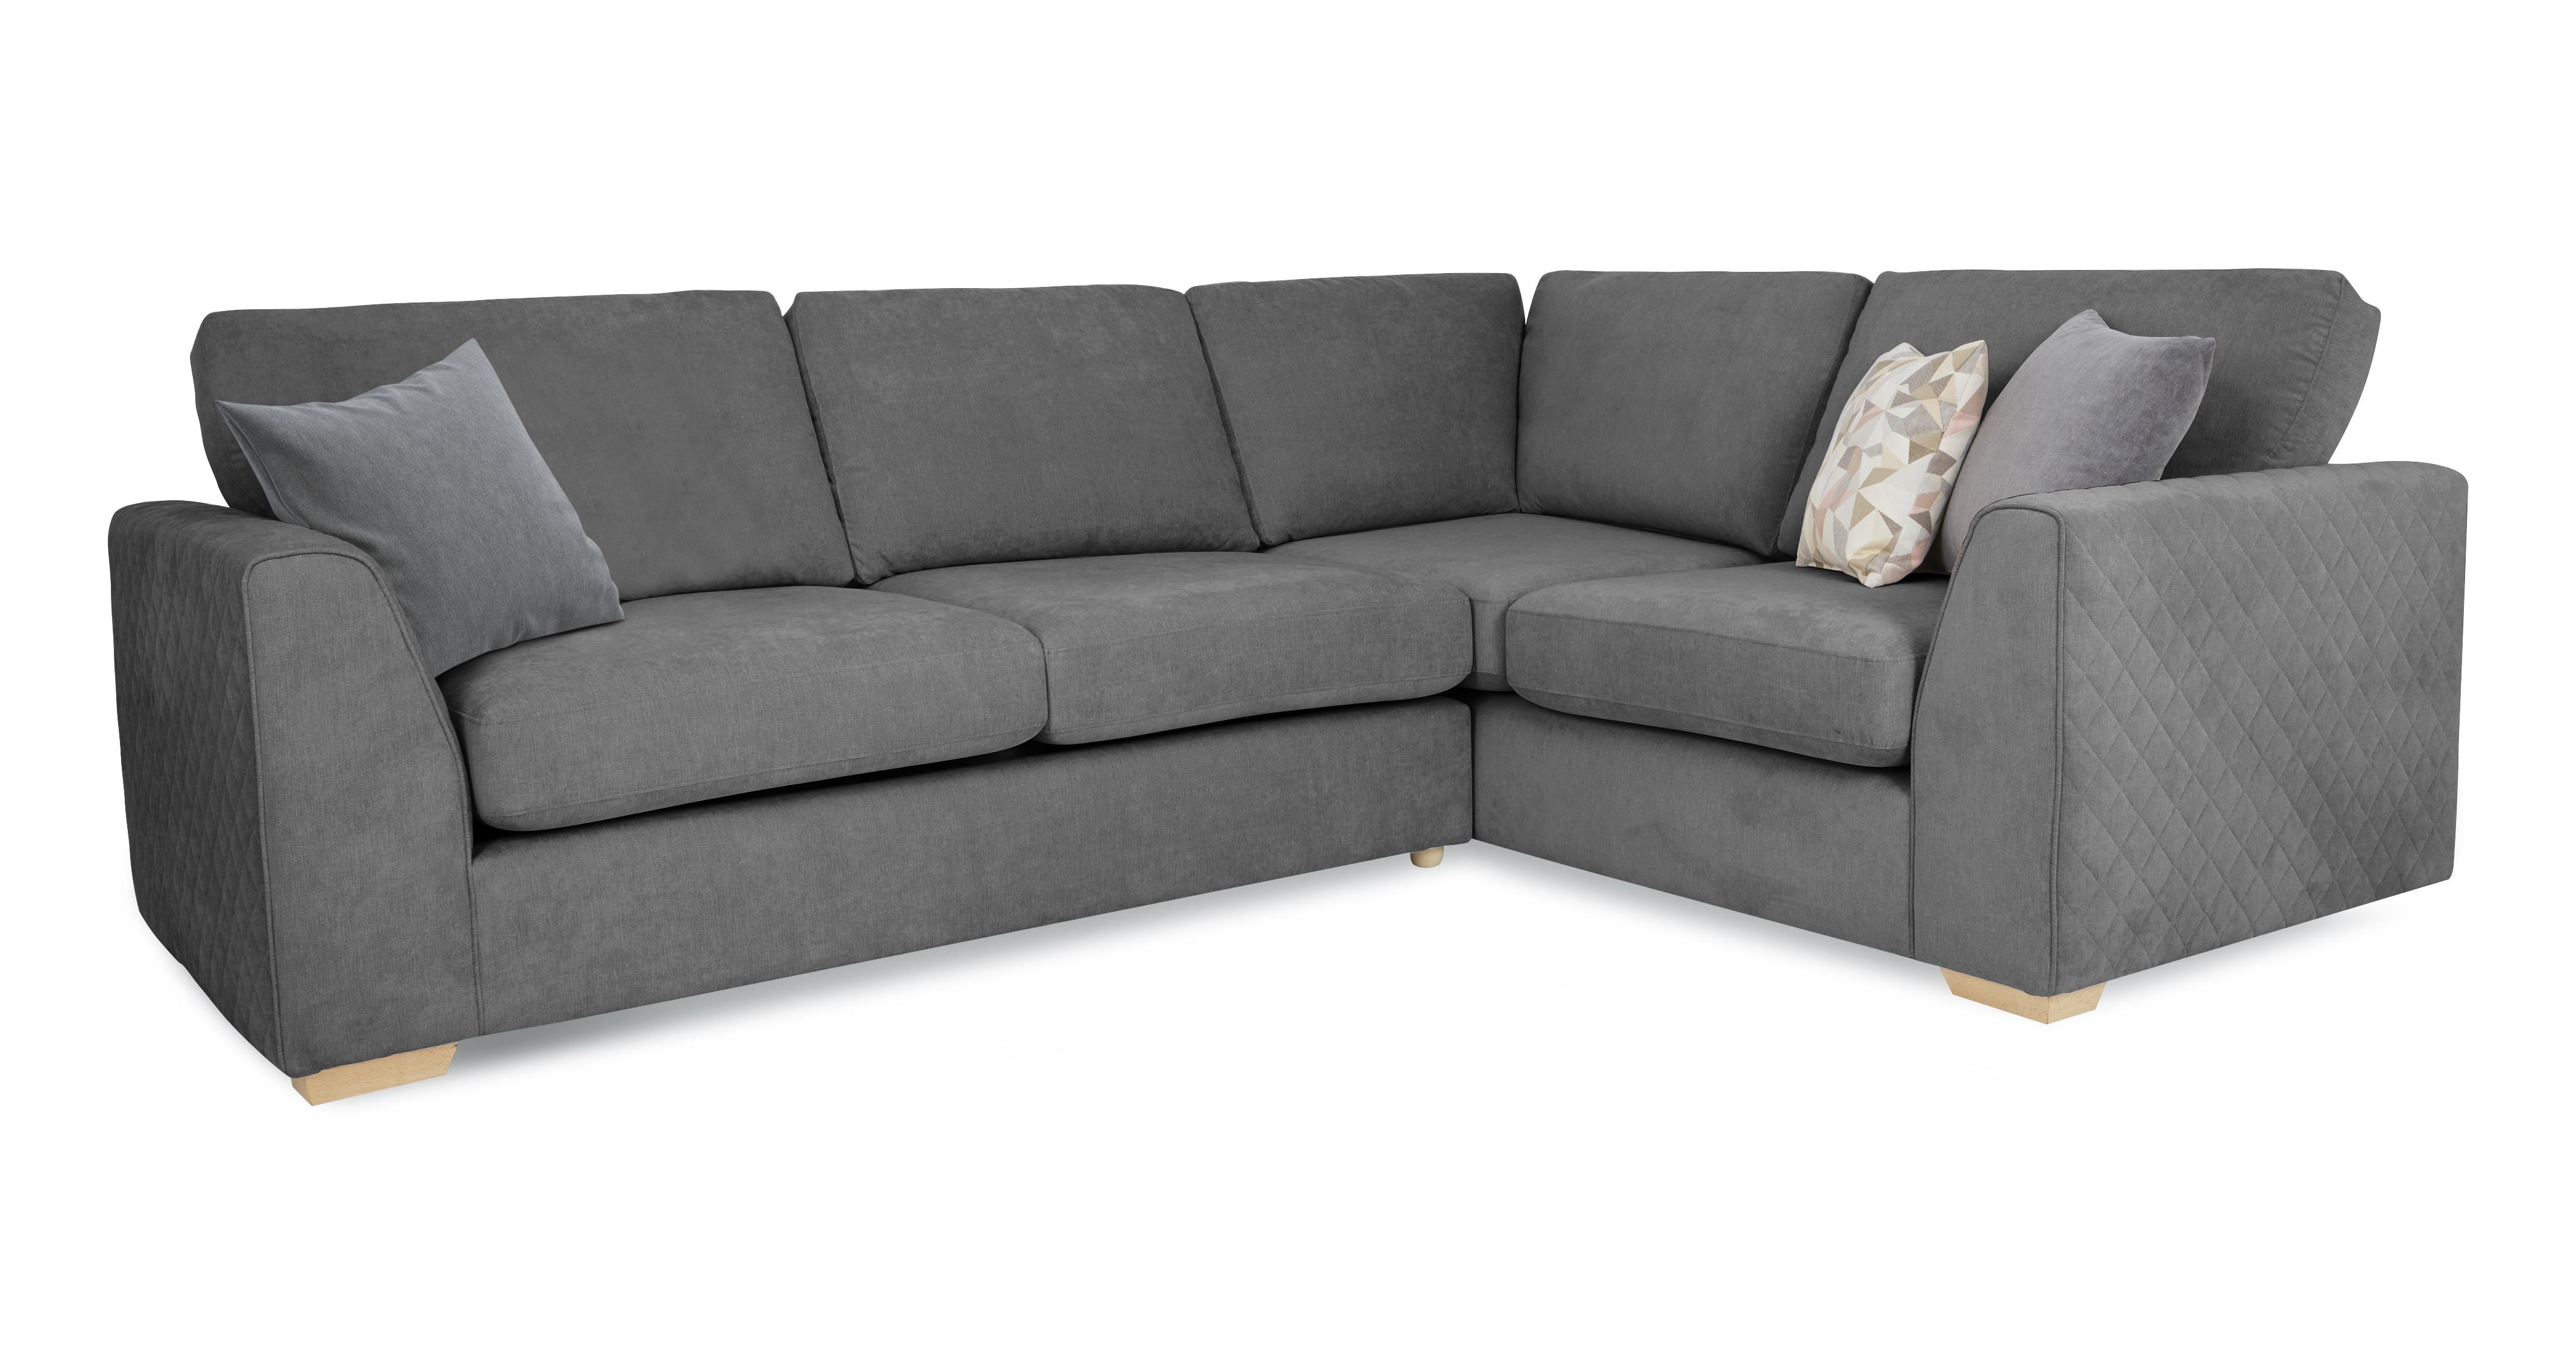 8 seater corner sofa sofa menzilperdenet for 8 seat sectional sofa